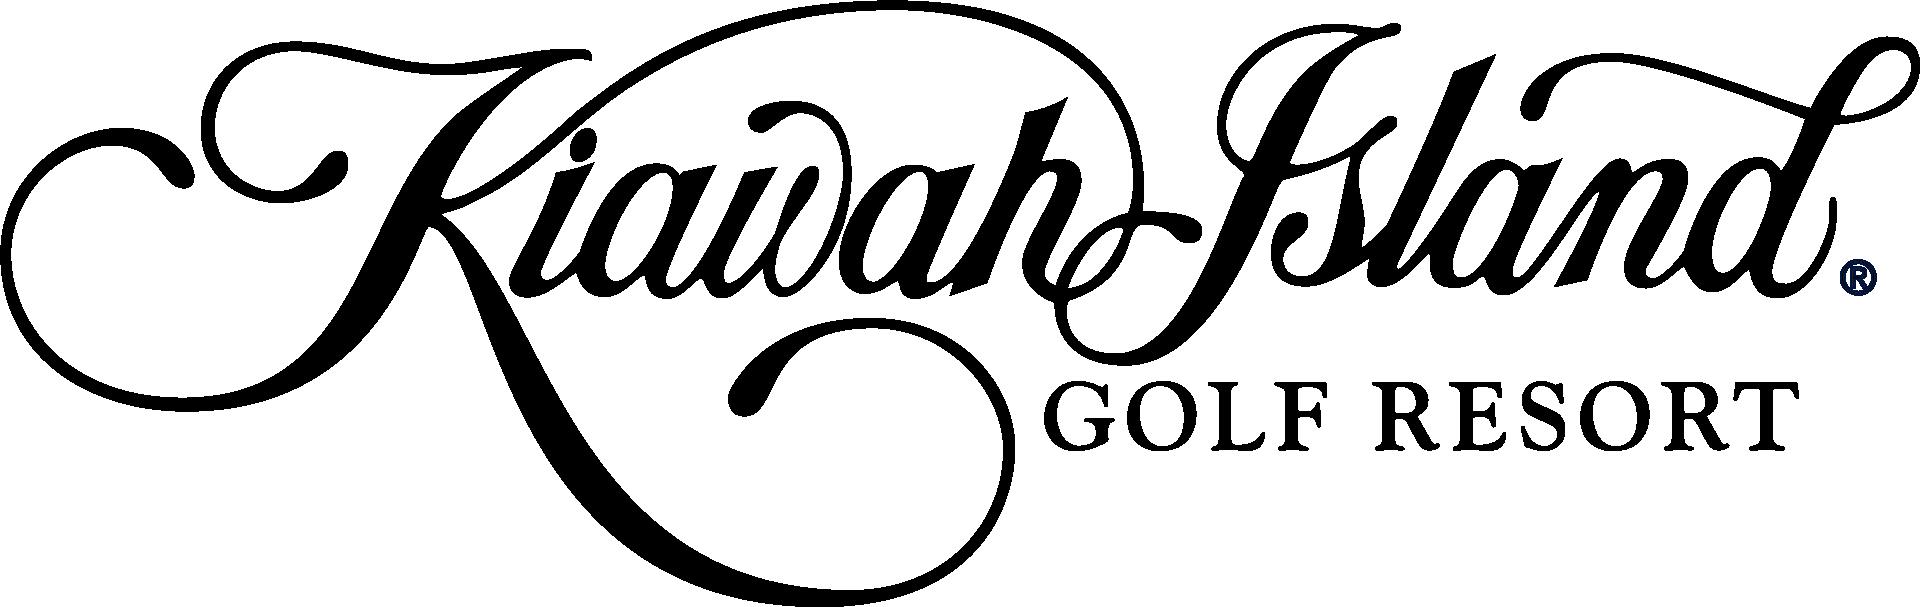 Kiawah Island Golf Resort Logo